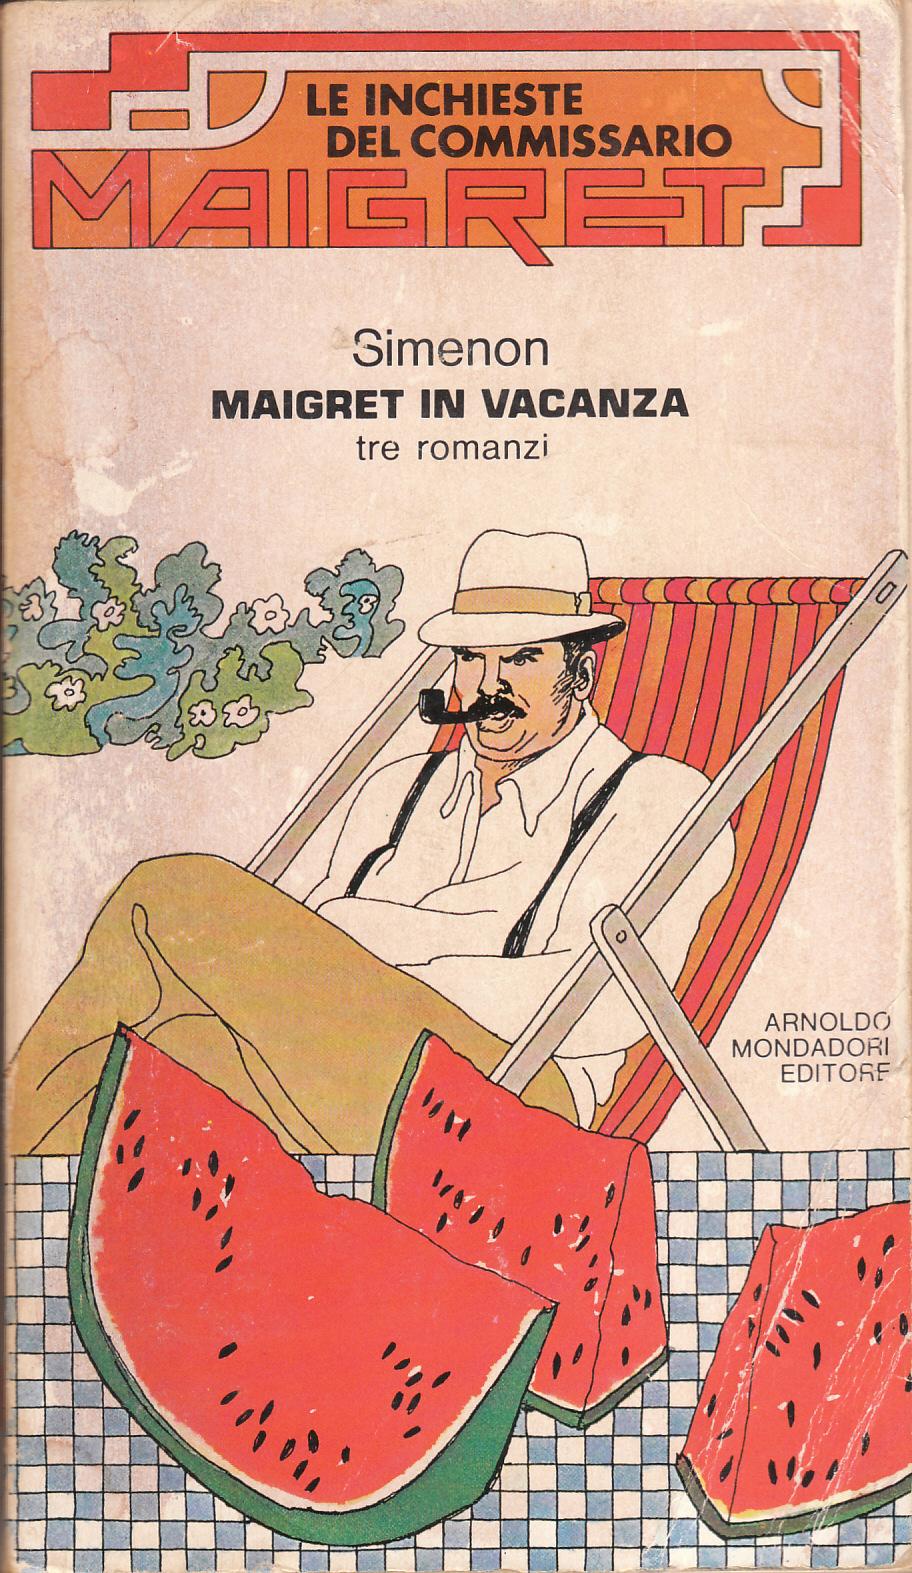 Maigret in vacanza